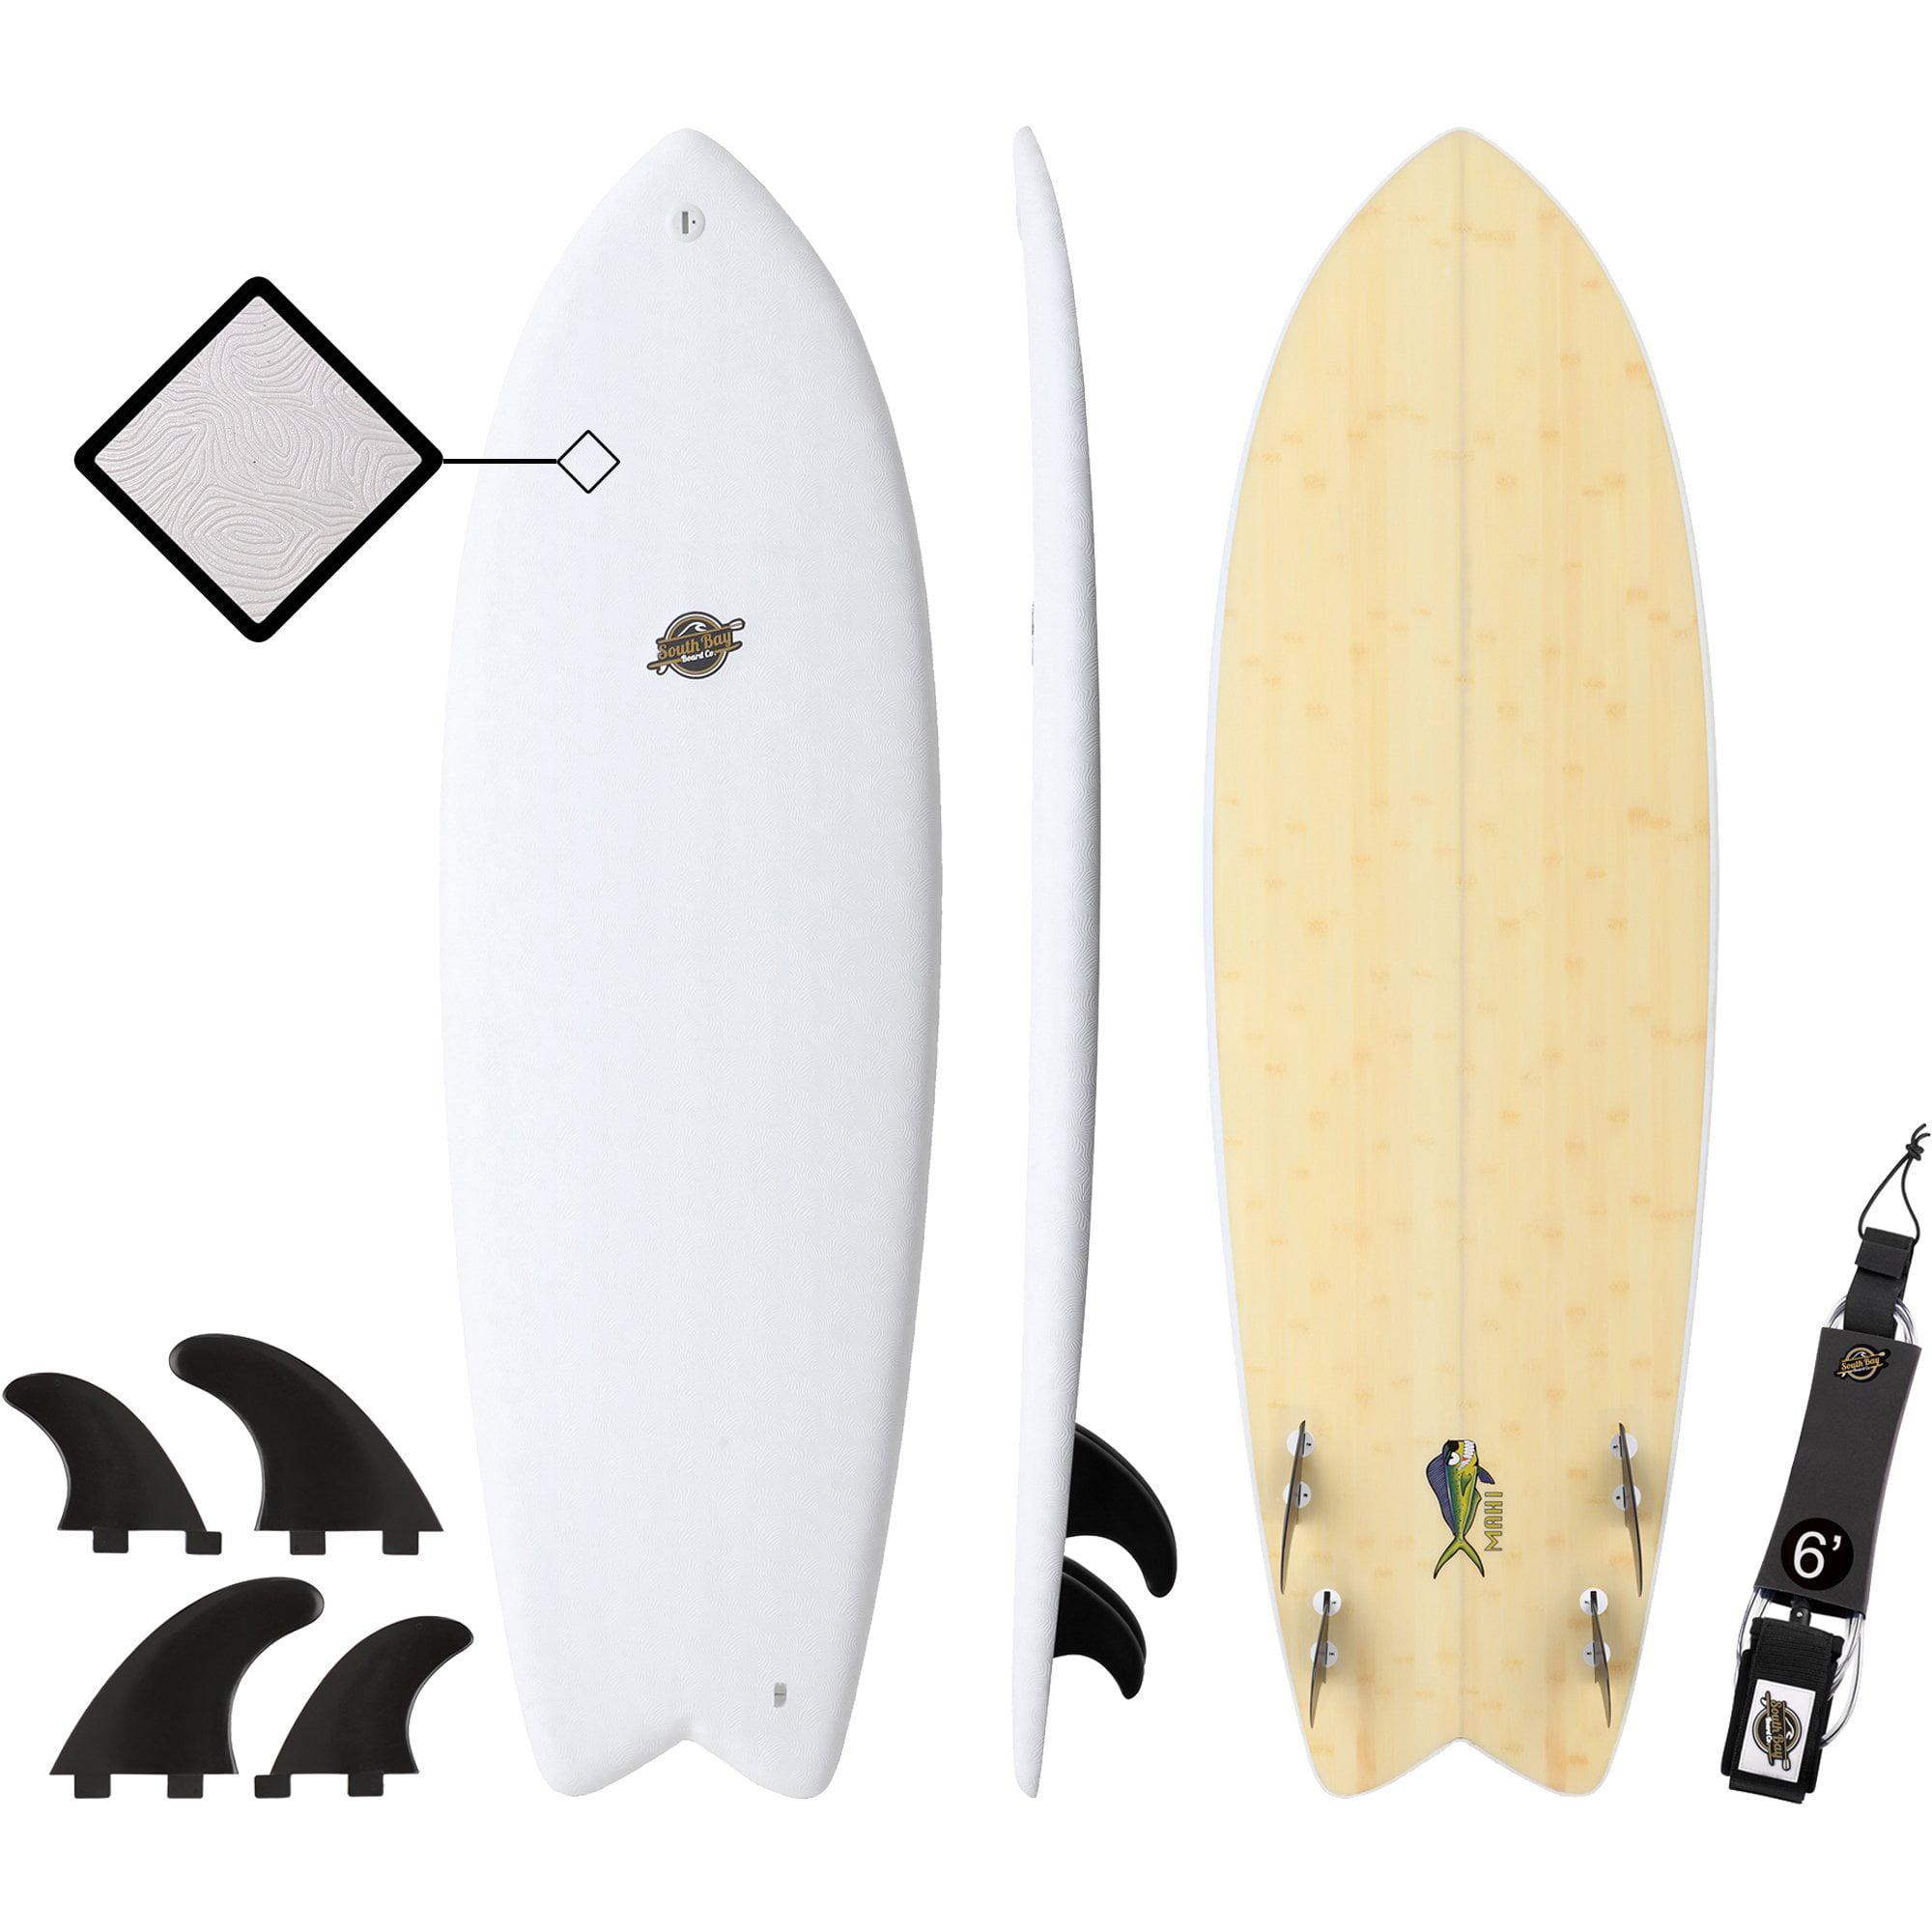 South Bay Board Co. 5'8 Mahi Hybrid Soft Top Surfboard, Leash & Fins